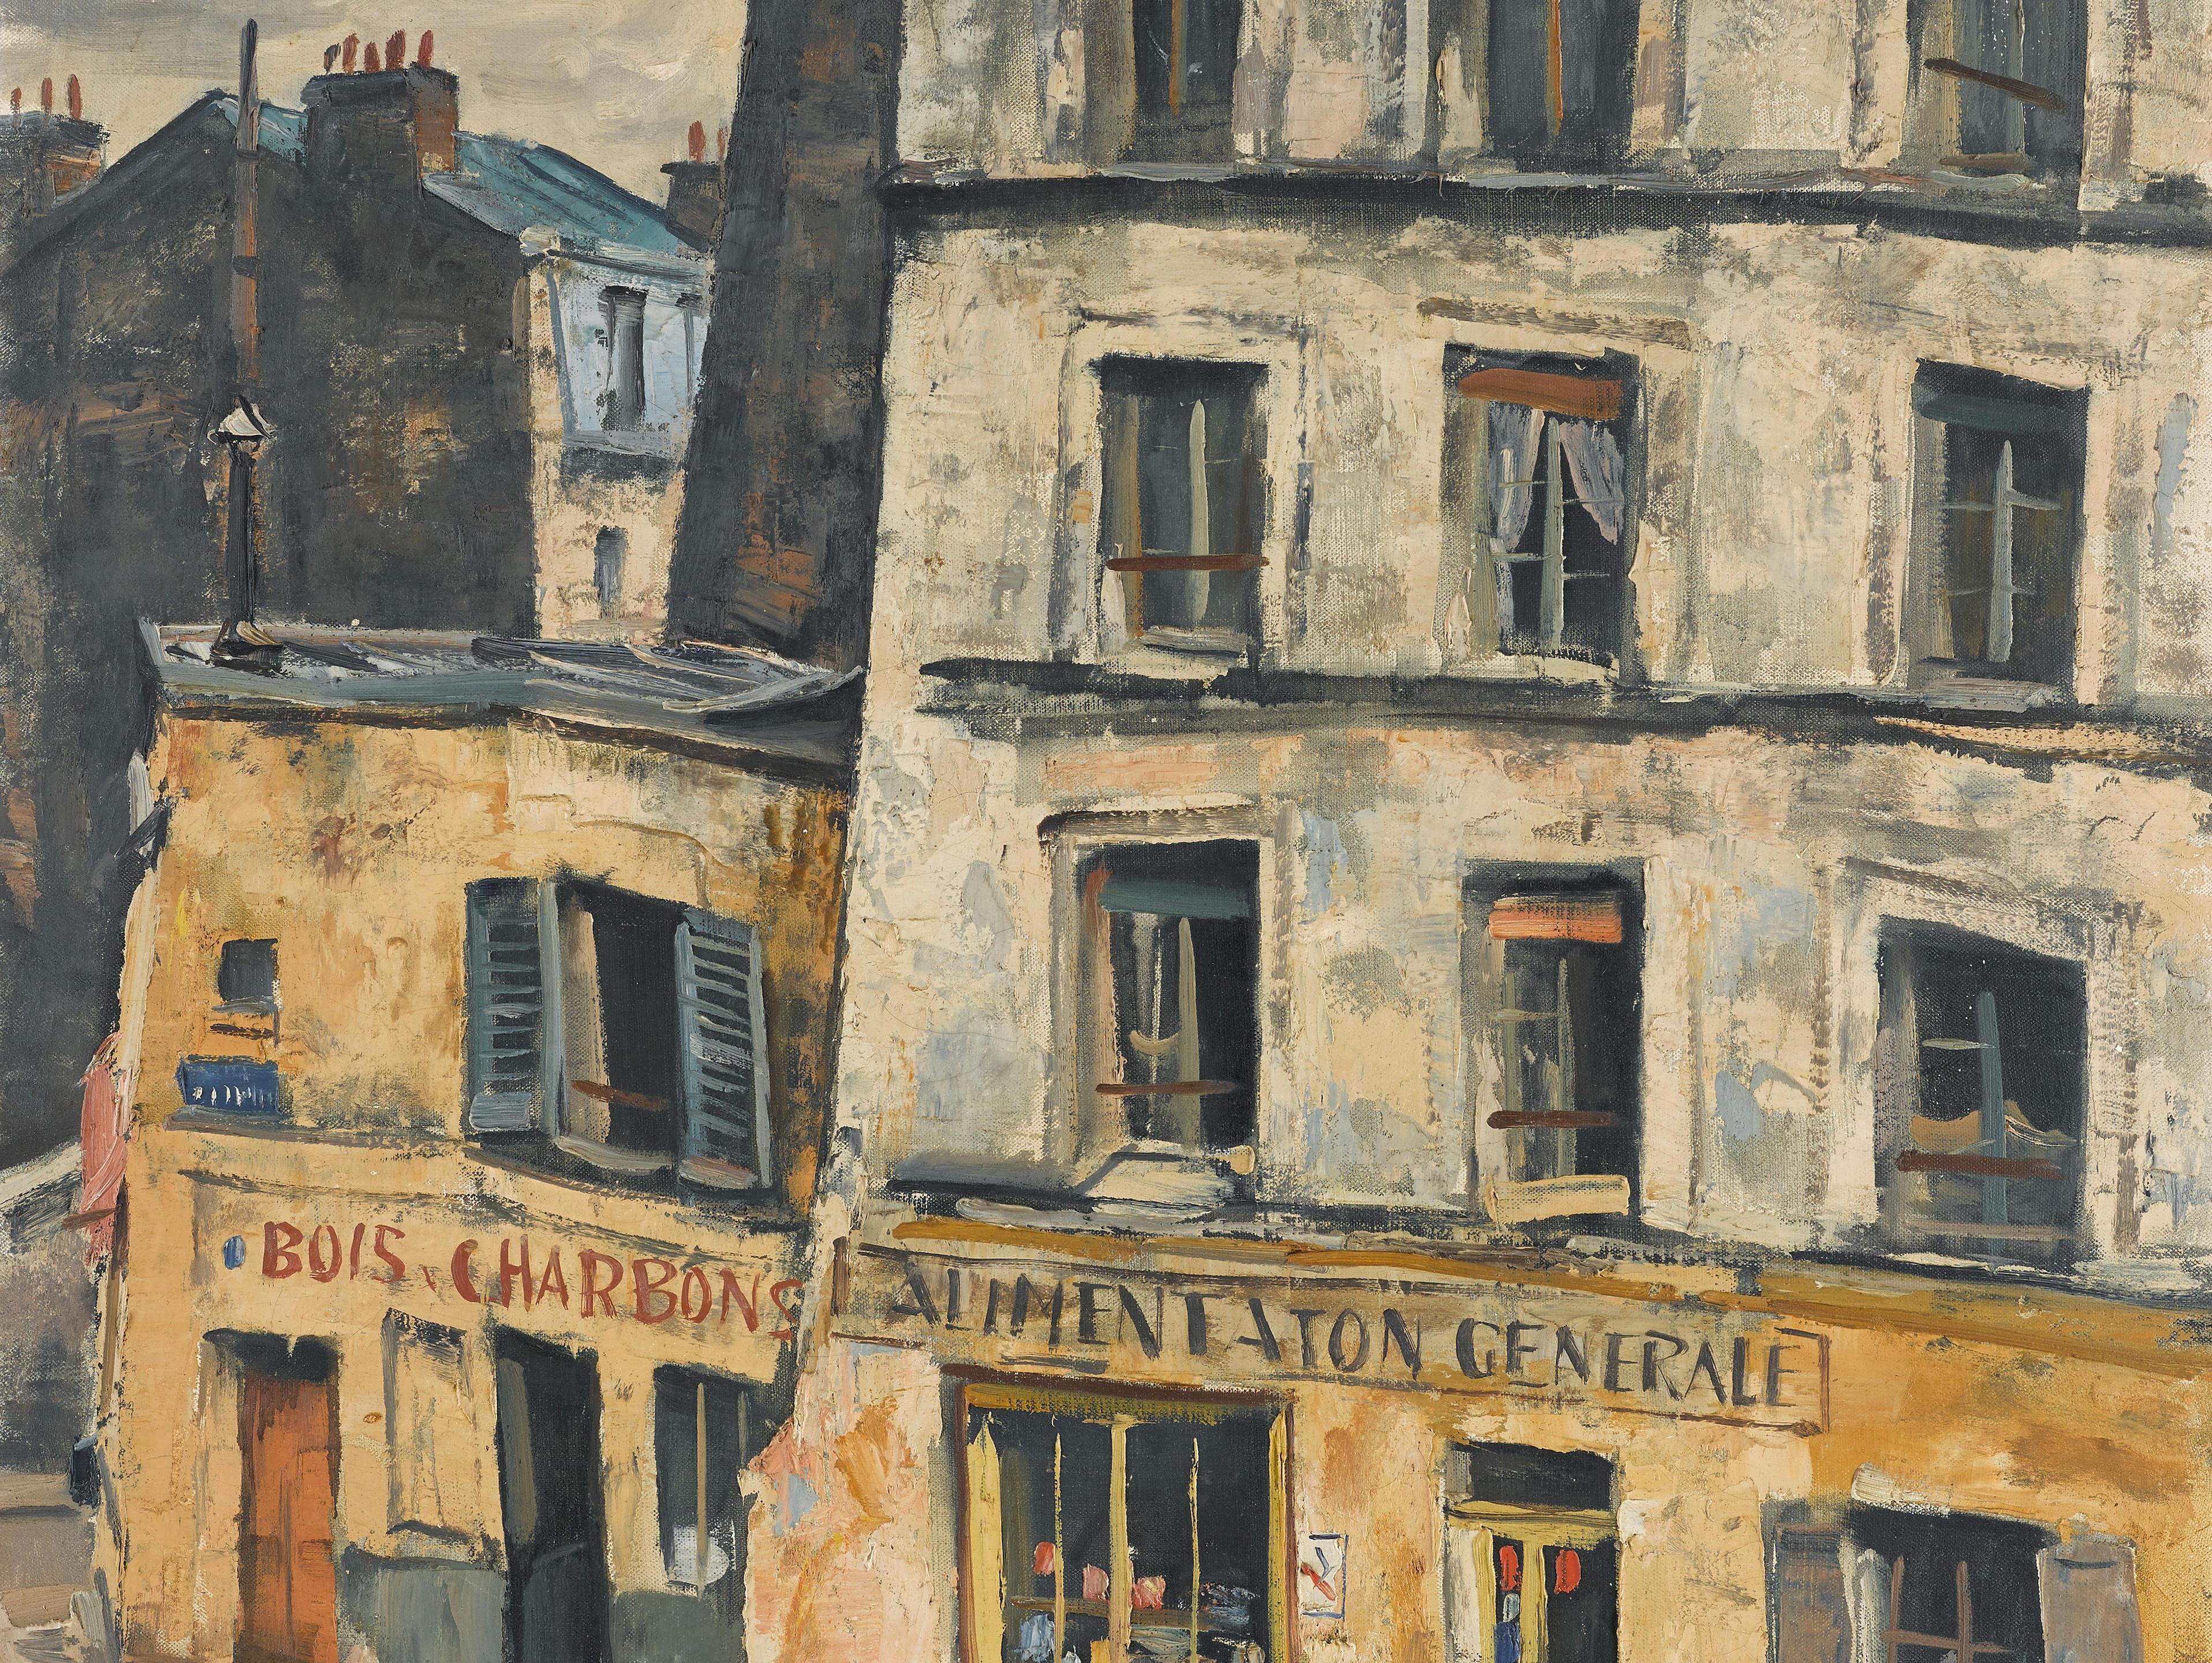 TAKANORI OGUISS (1901-1986) Rue Gabrielle, boutiques jaunes de Montmartre 28 3/4 x 23 1/2 in (72.8 x 59.7 cm) (Painted circa 1949)